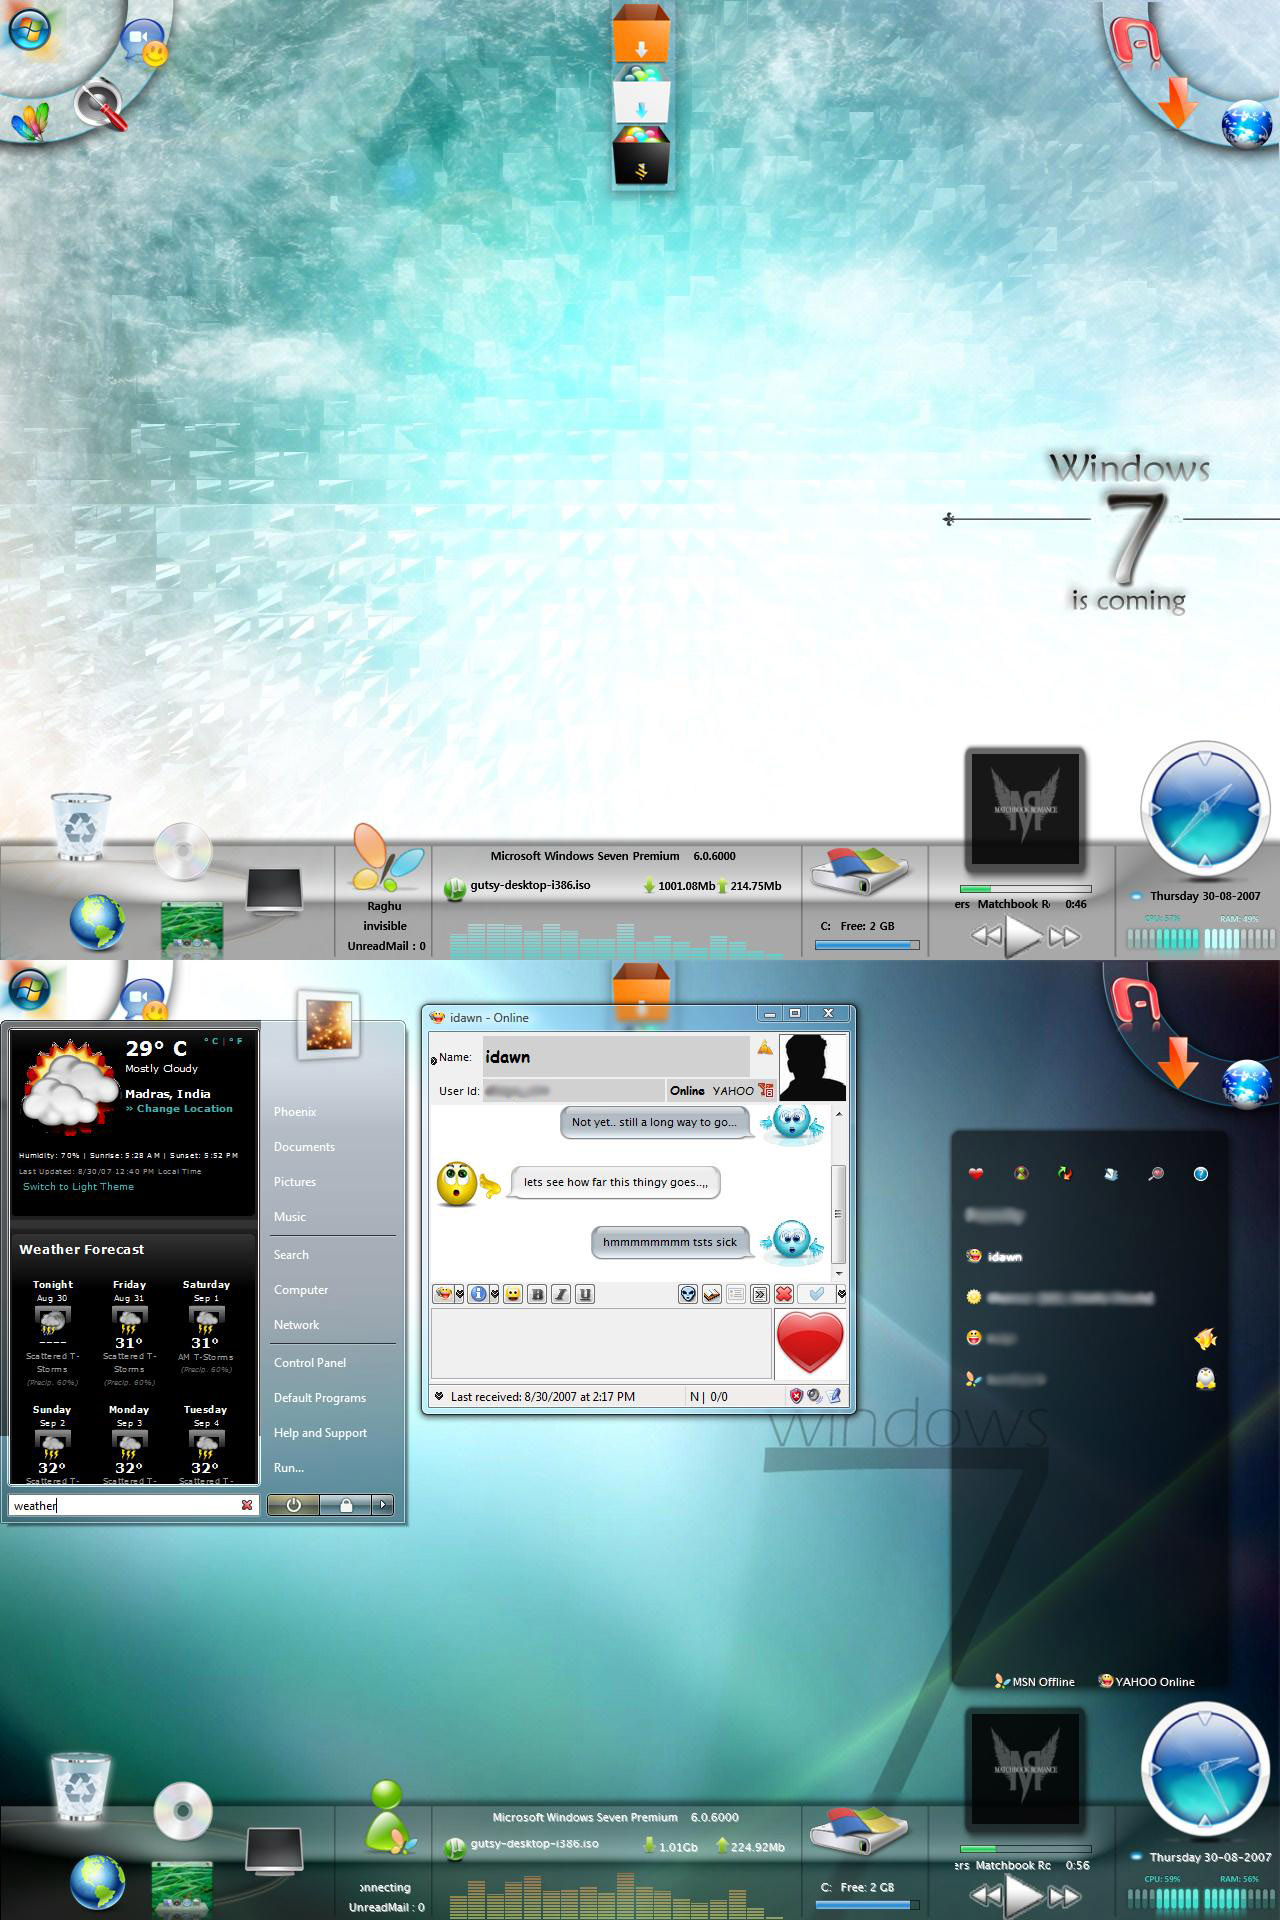 Poszukuję tego theme do Windows 7